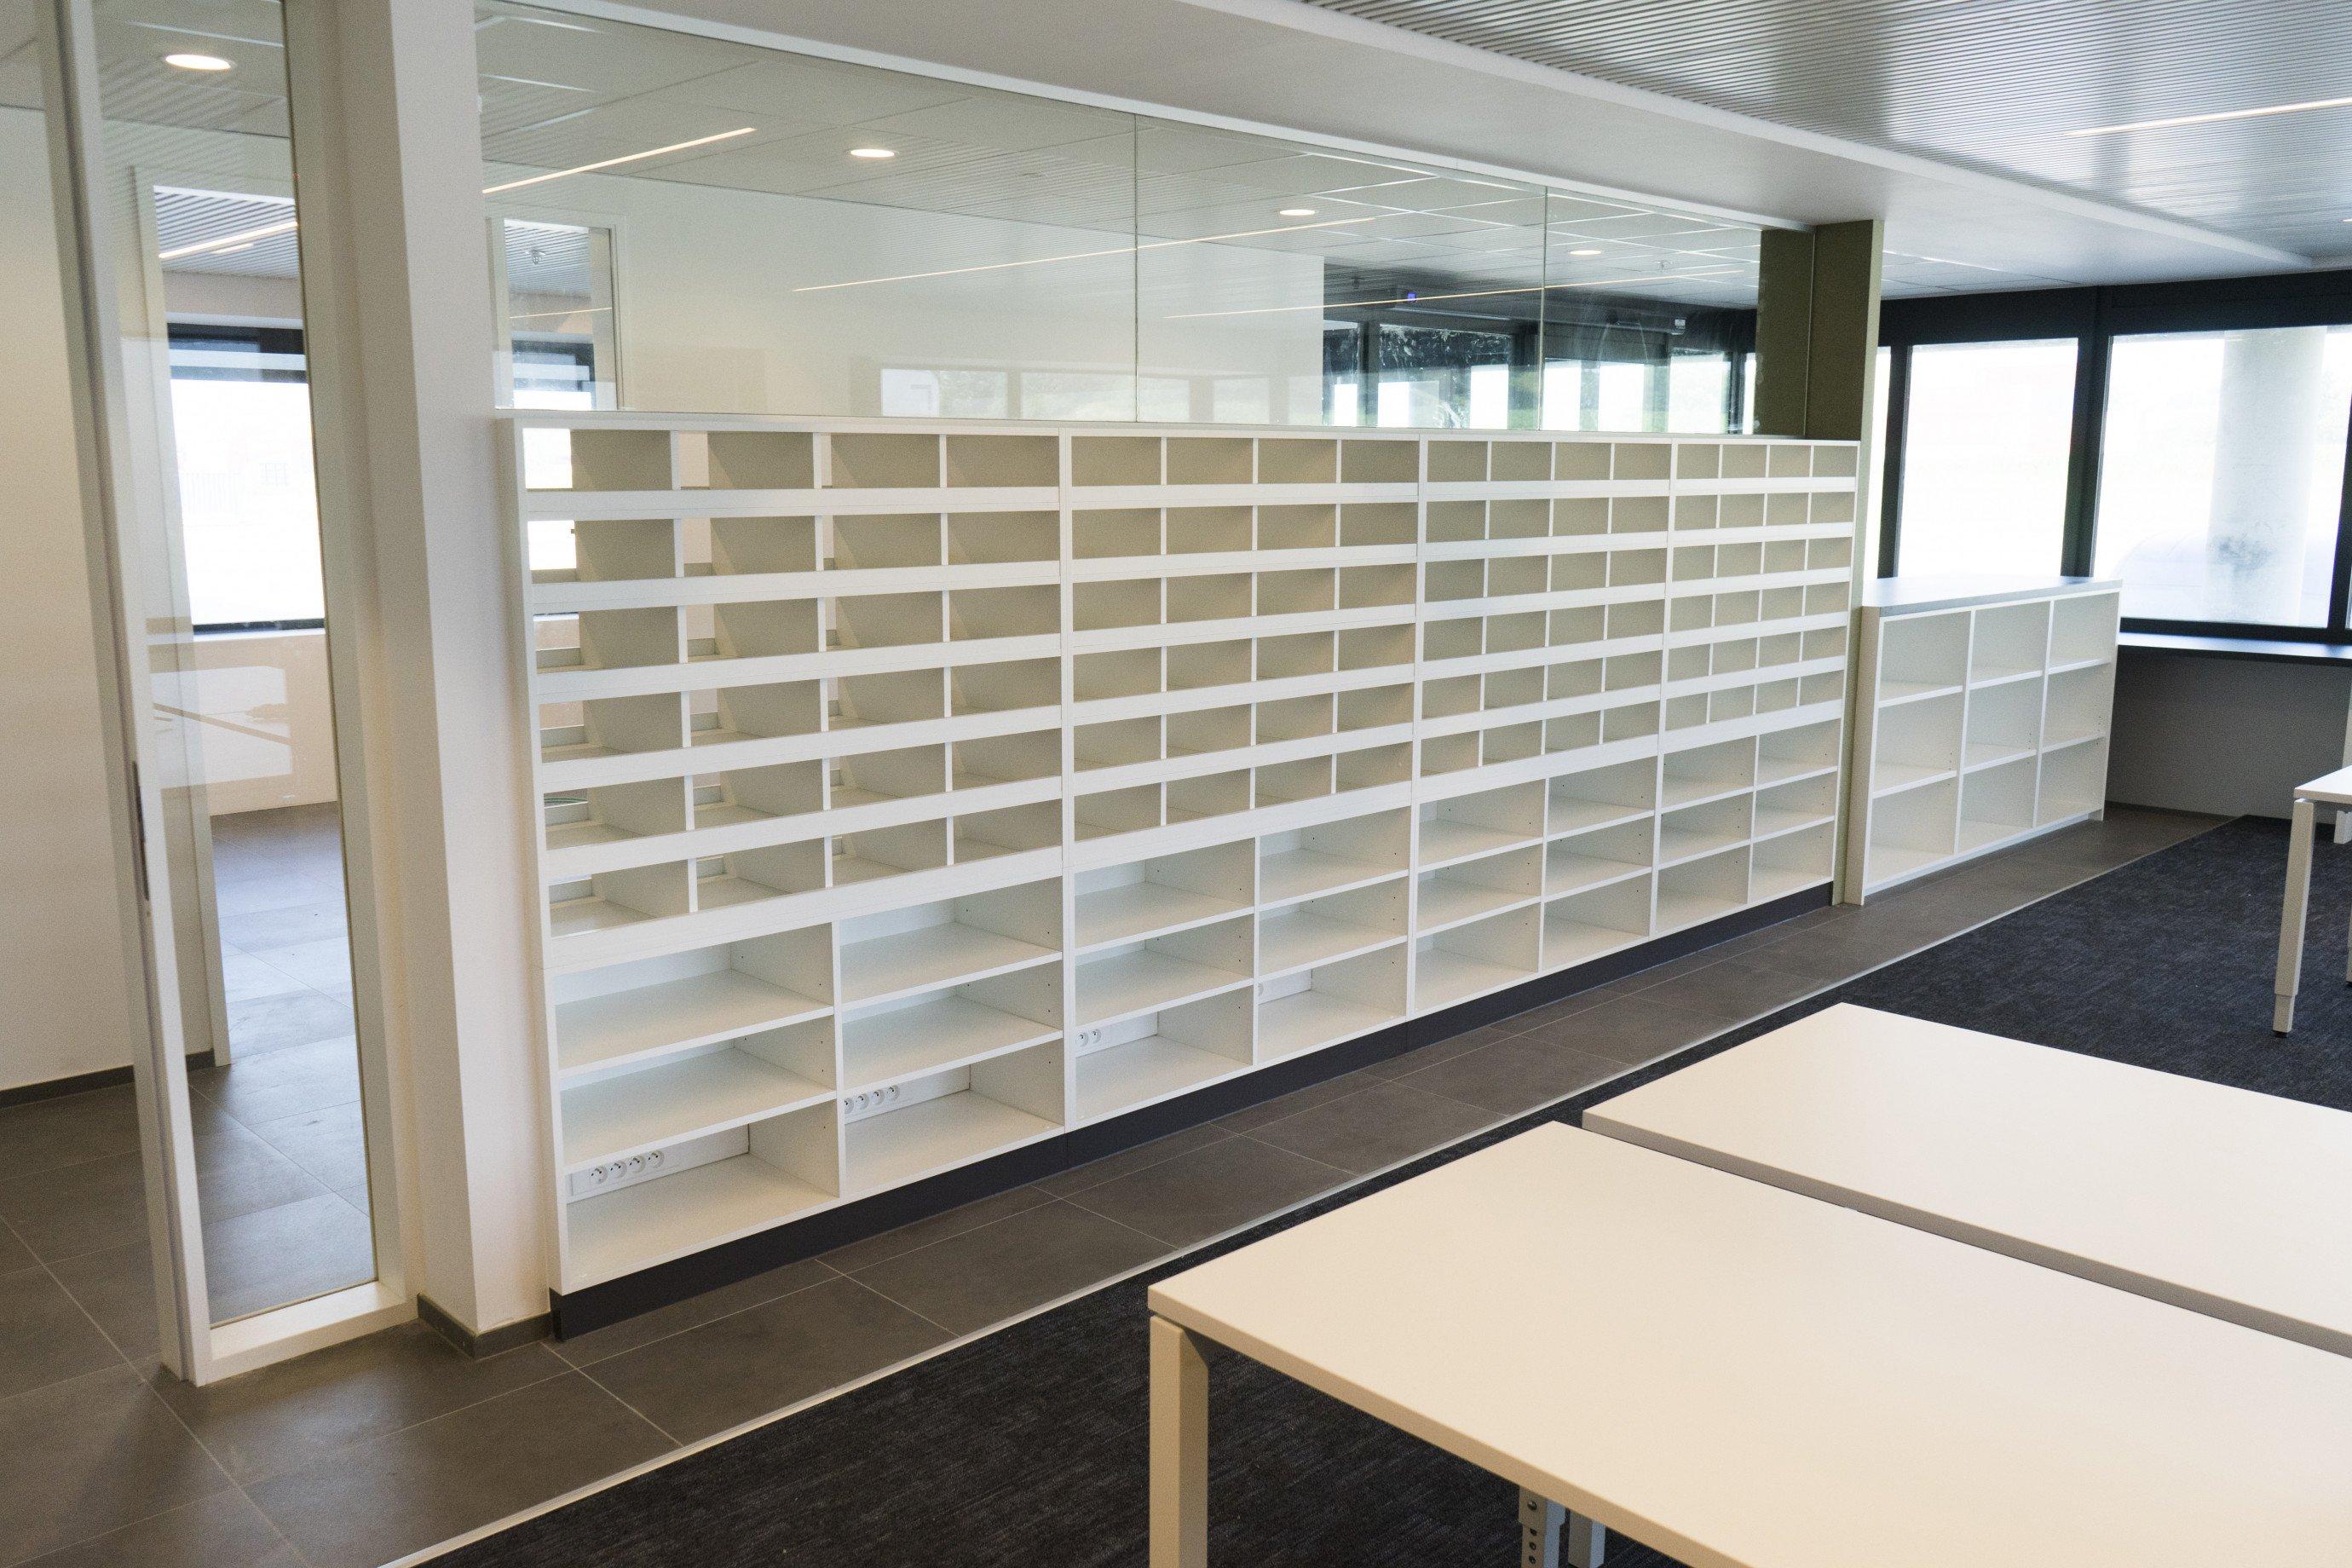 Laboratoriummeubilair: postvakken